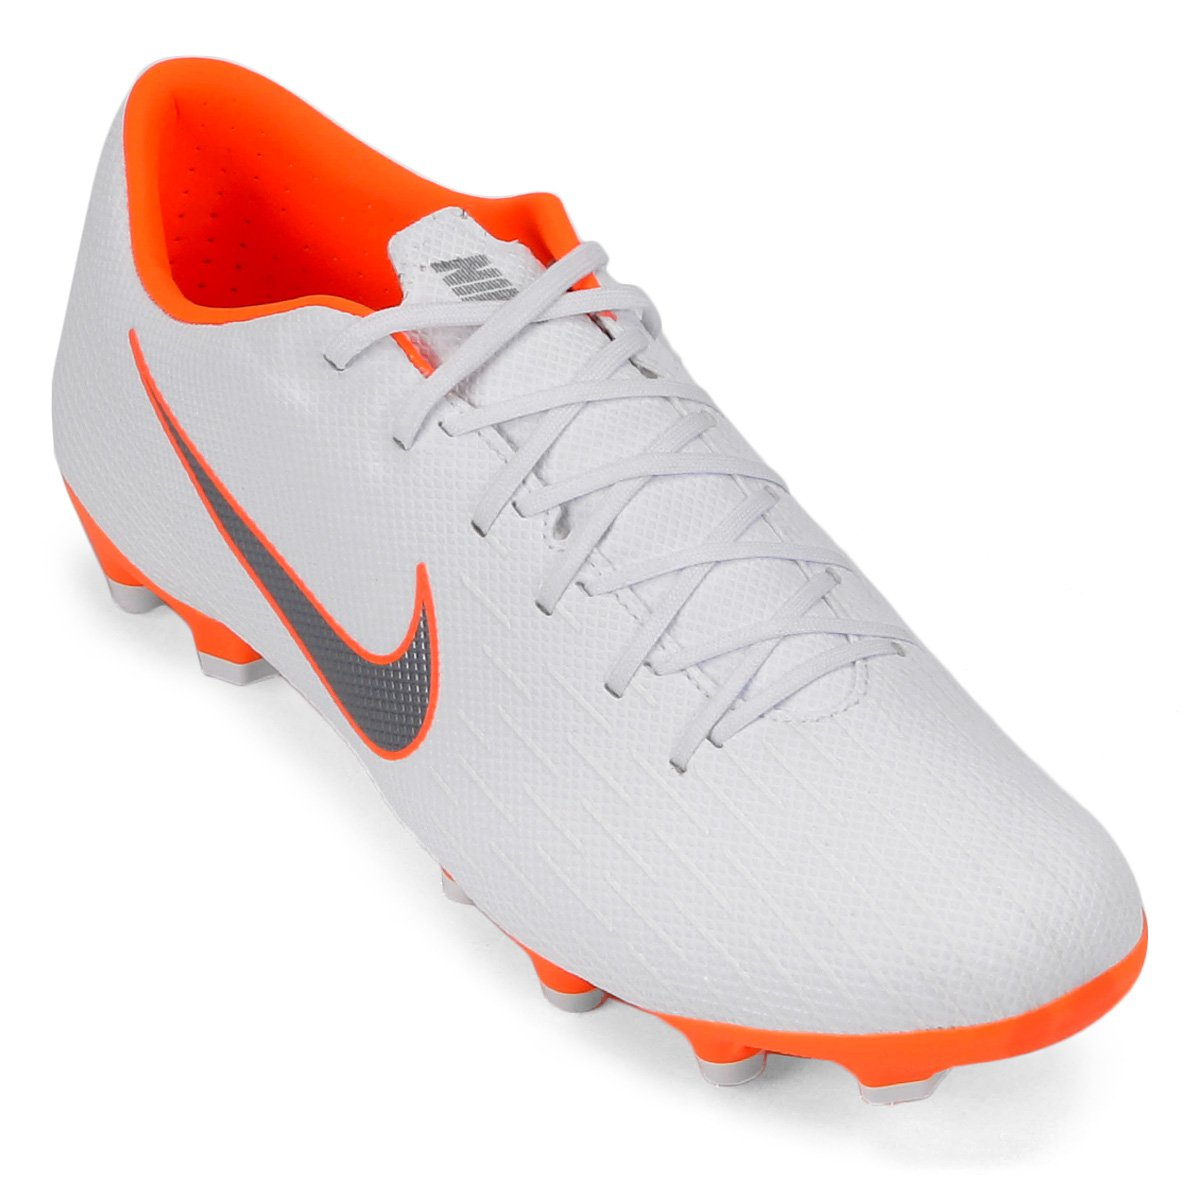 Chuteira Campo Nike Mercurial Vapor 12 Academy - Branco e Cinza ... ff15630b75b5b